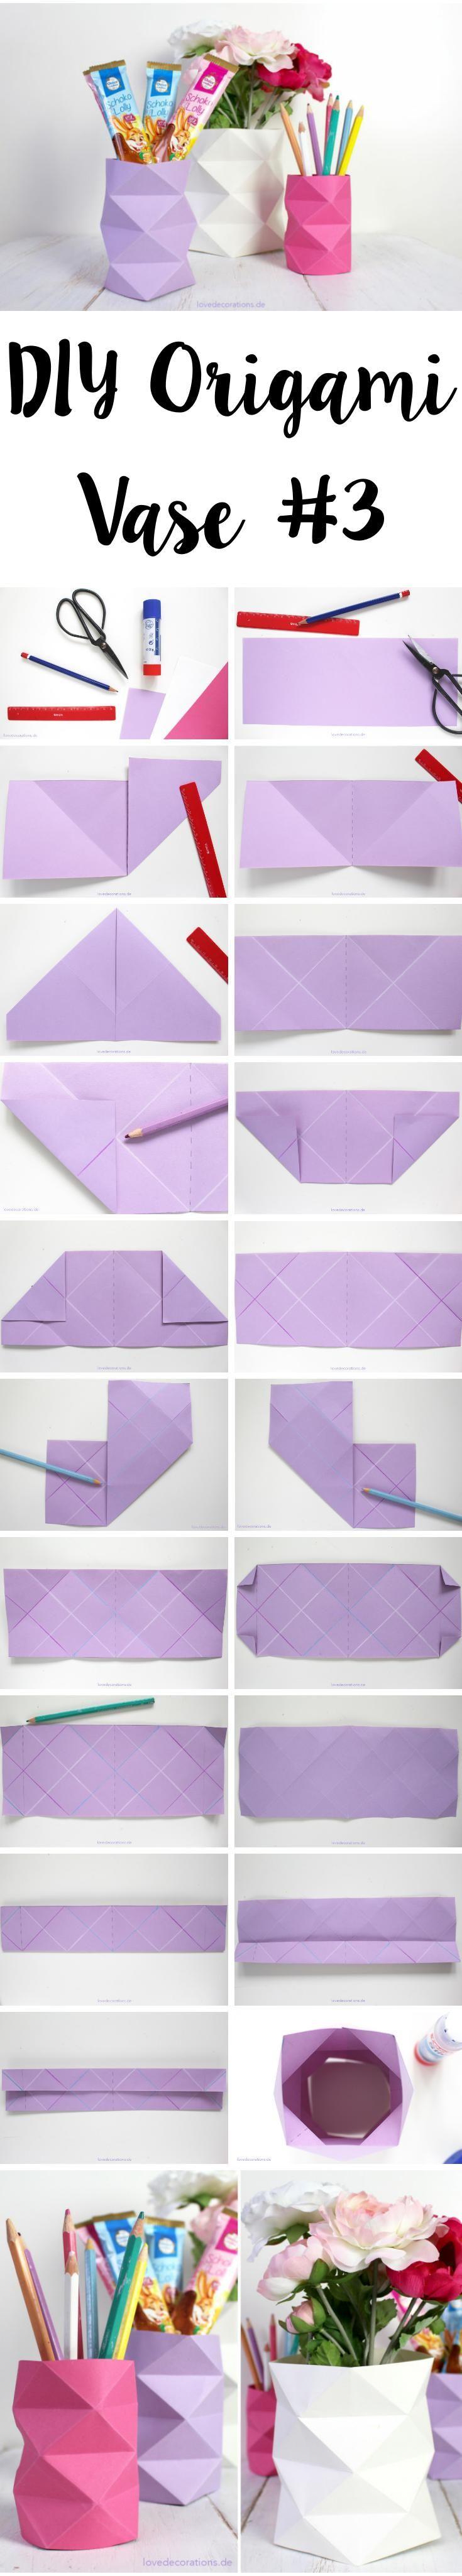 DIY Origami Papier-Vase | DIY Origami Vase made of Paper